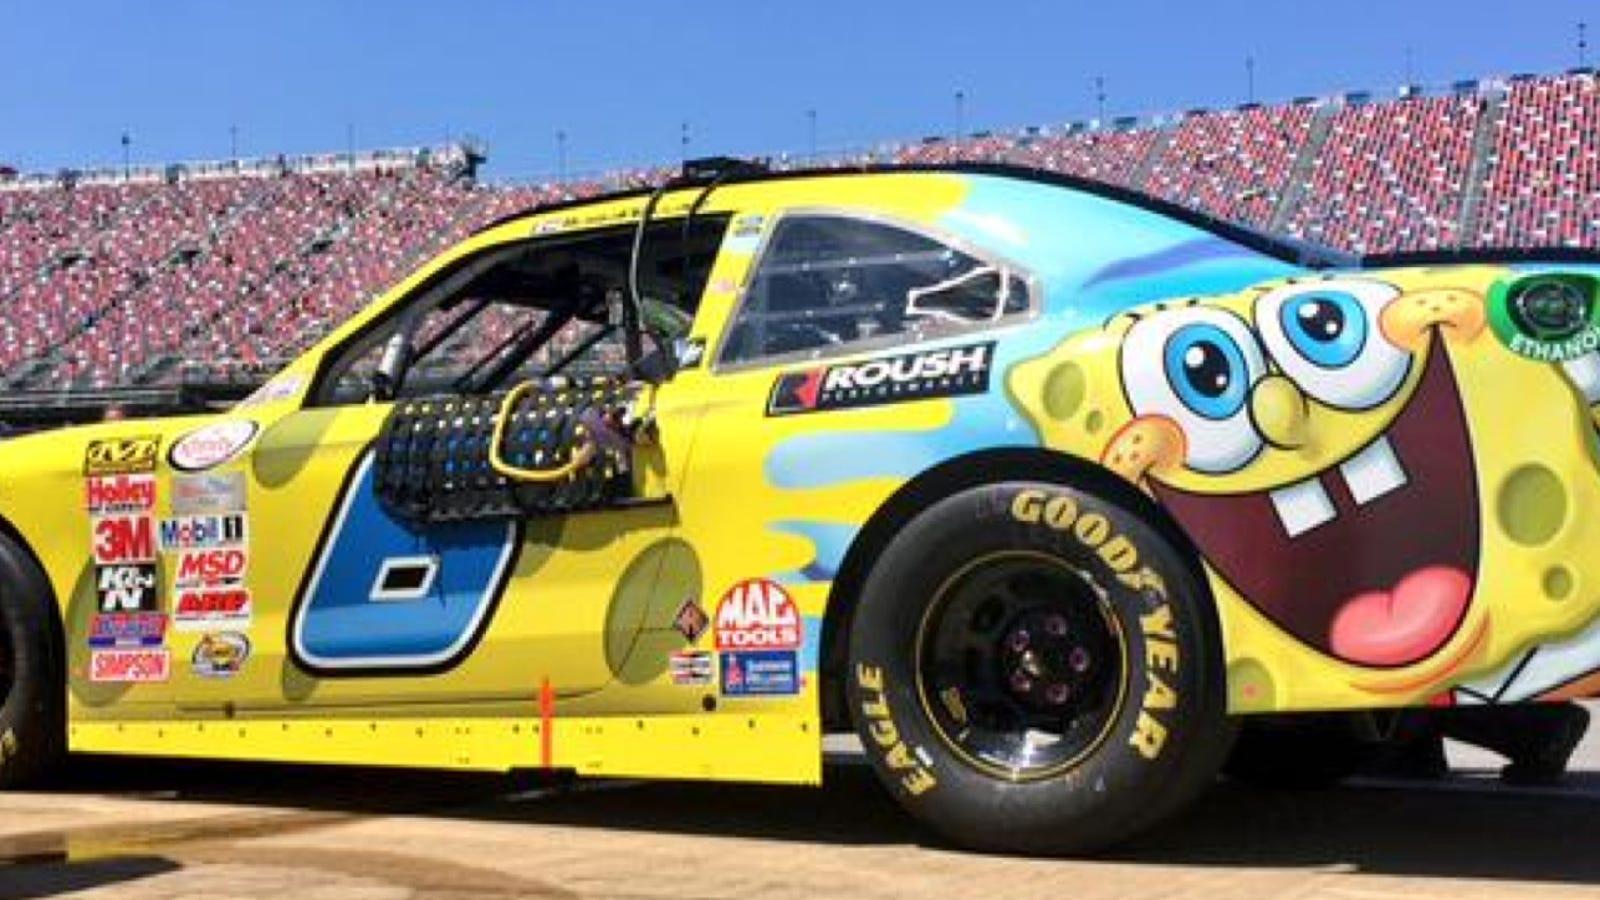 SpongeBob SquarePants On A Race Car: Great Livery, Or